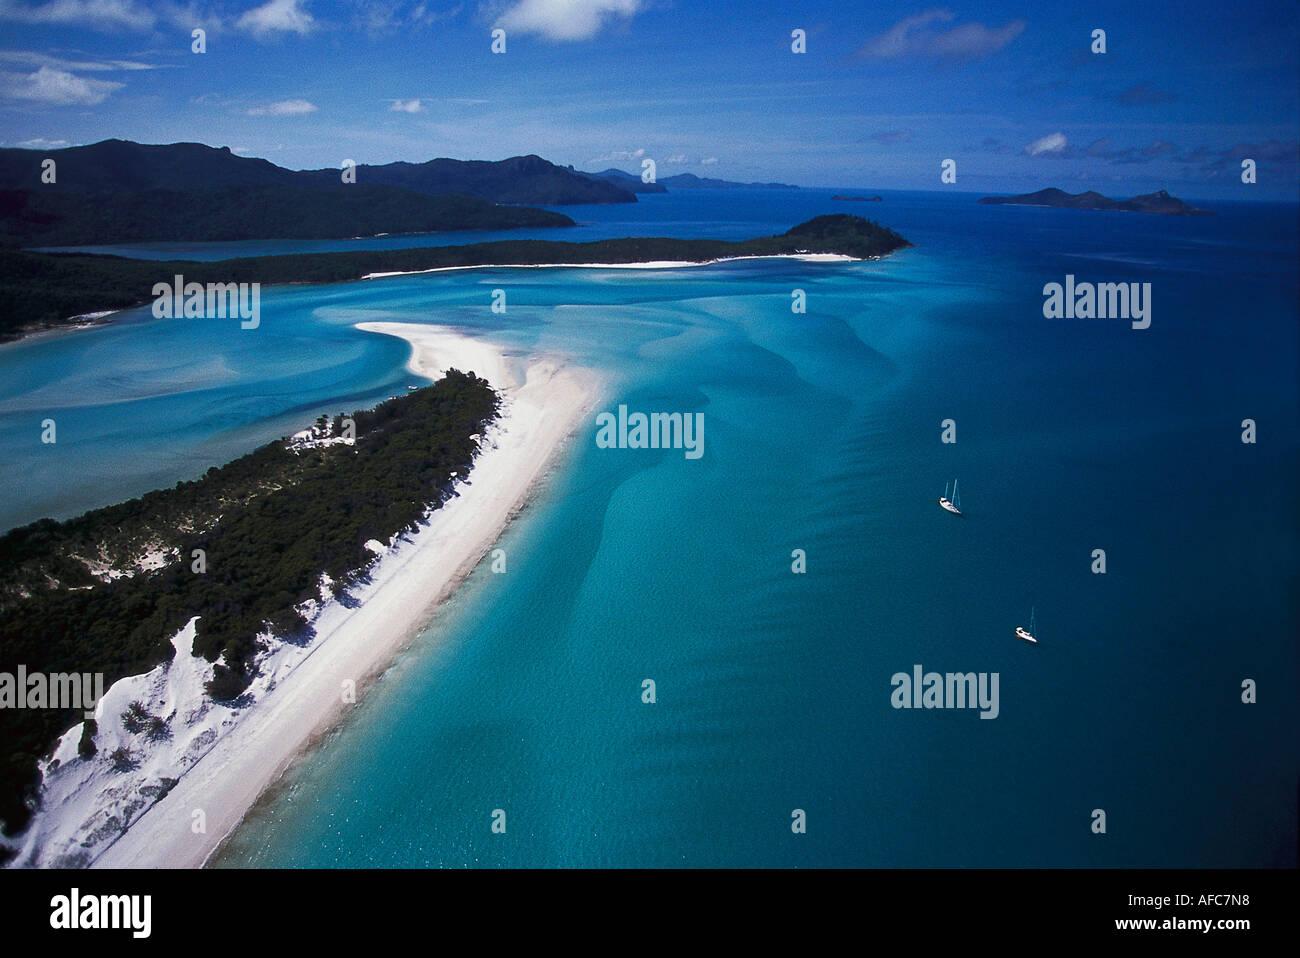 Whitehaven Beach, Luftbild, Whitsunday Island, Queensland Australien - Stock Image